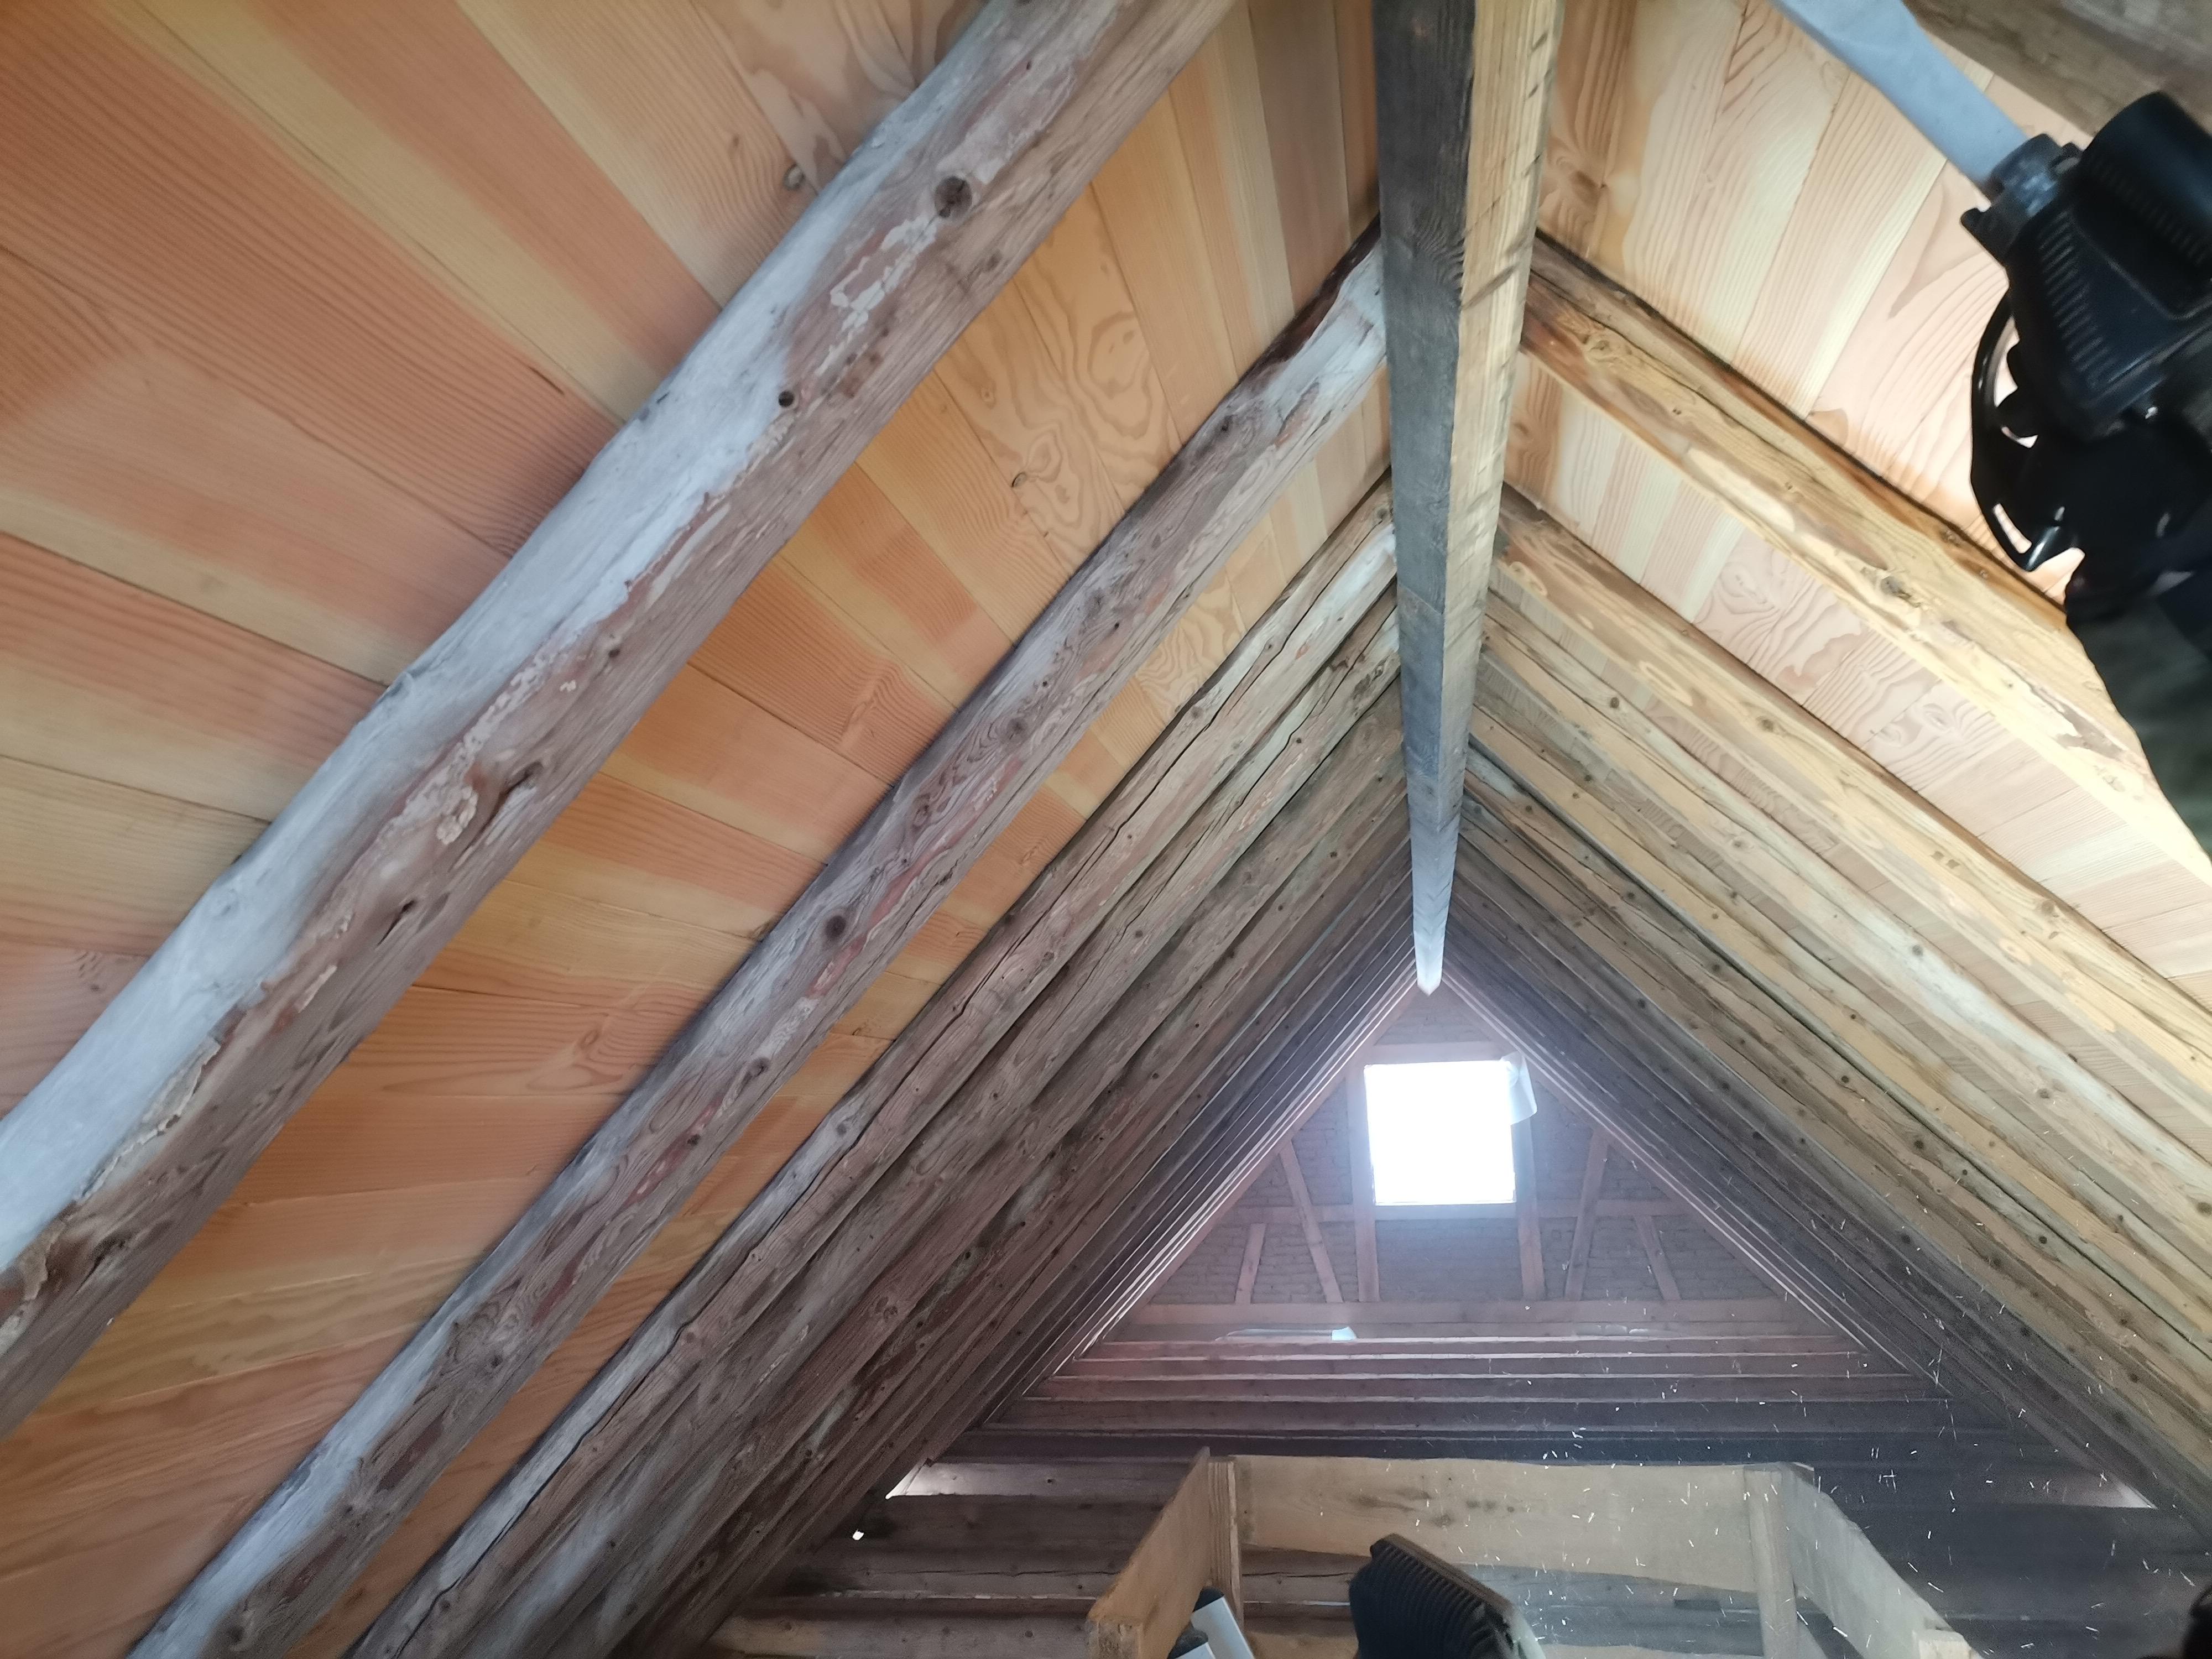 Beginn im Dachstuhl